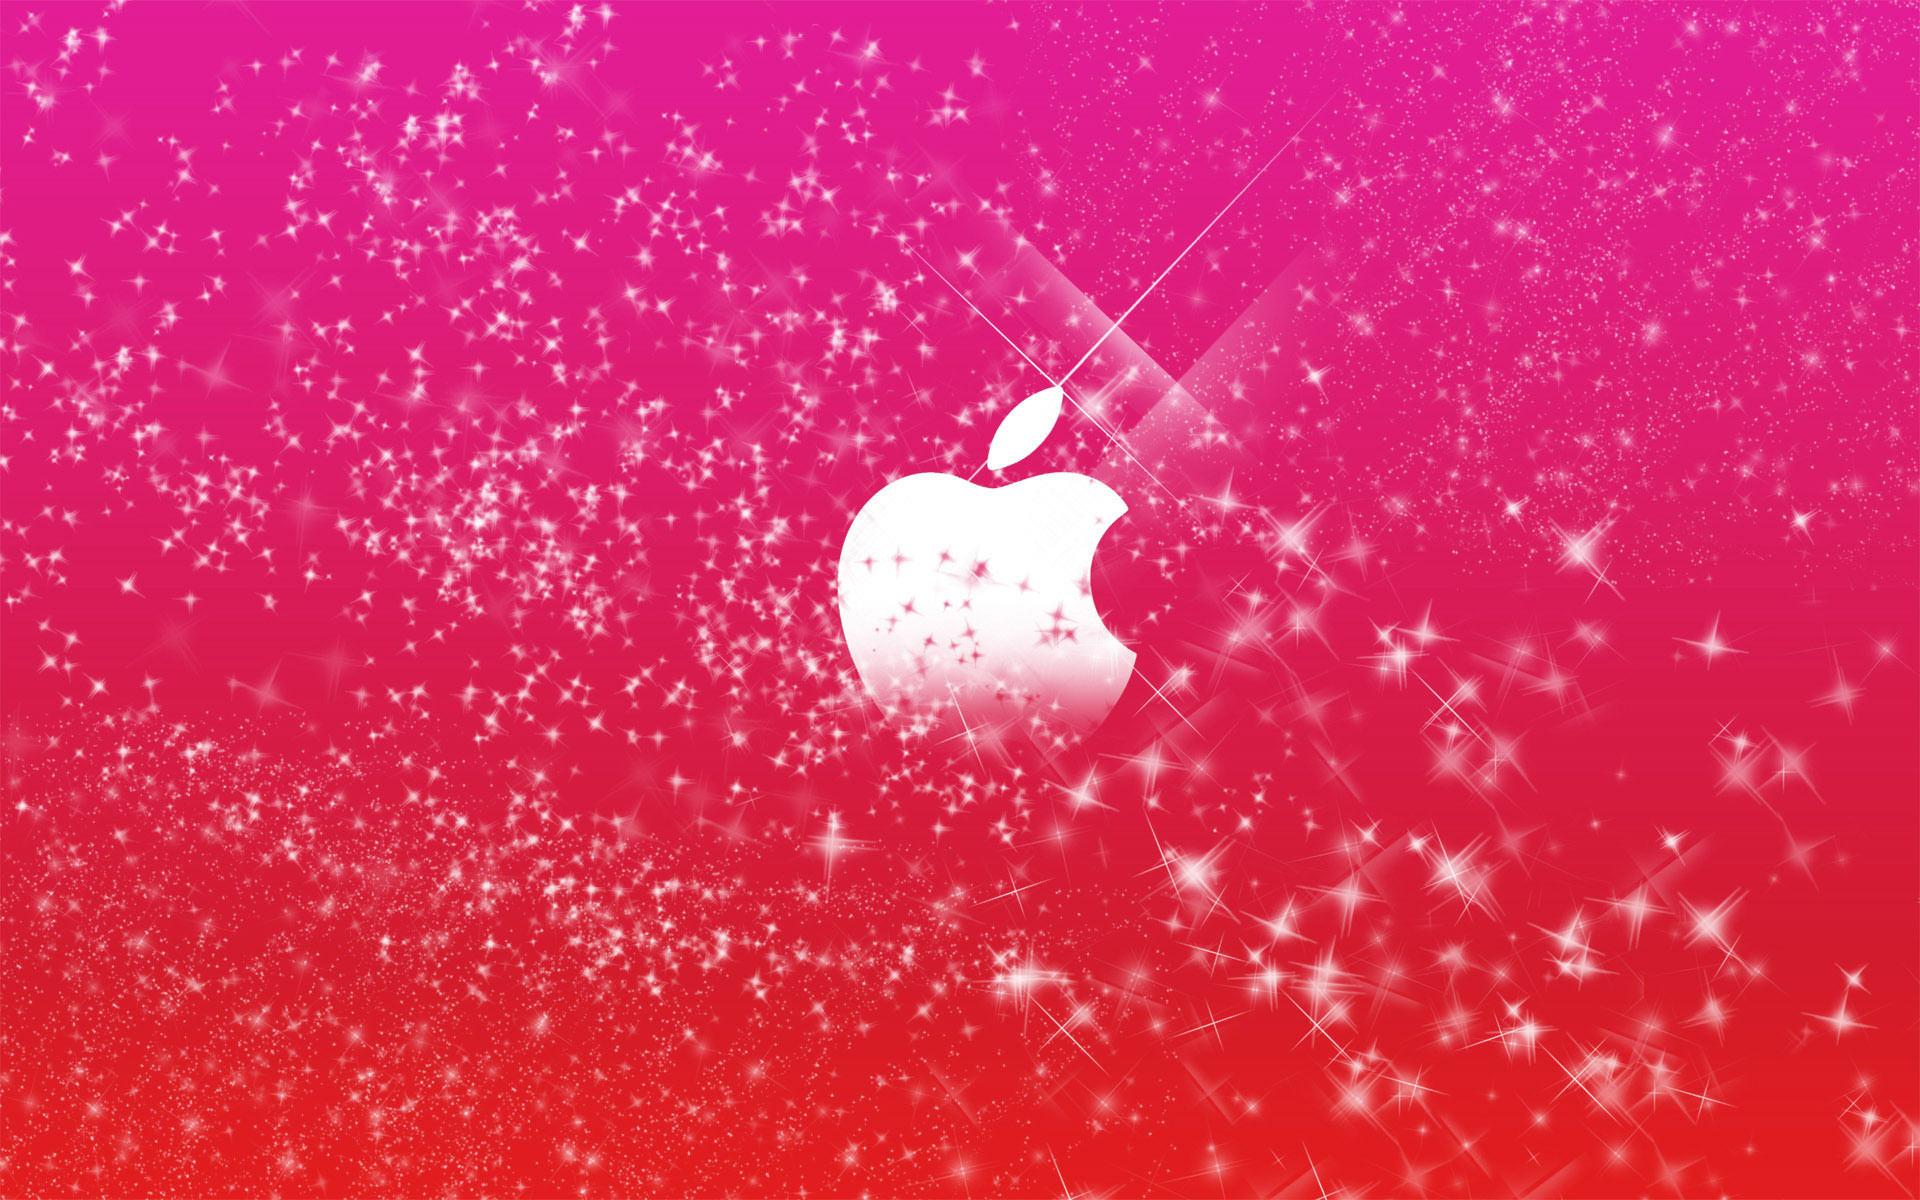 pink desktop backgrounds   pink desktop backgrounds free   Desktop .